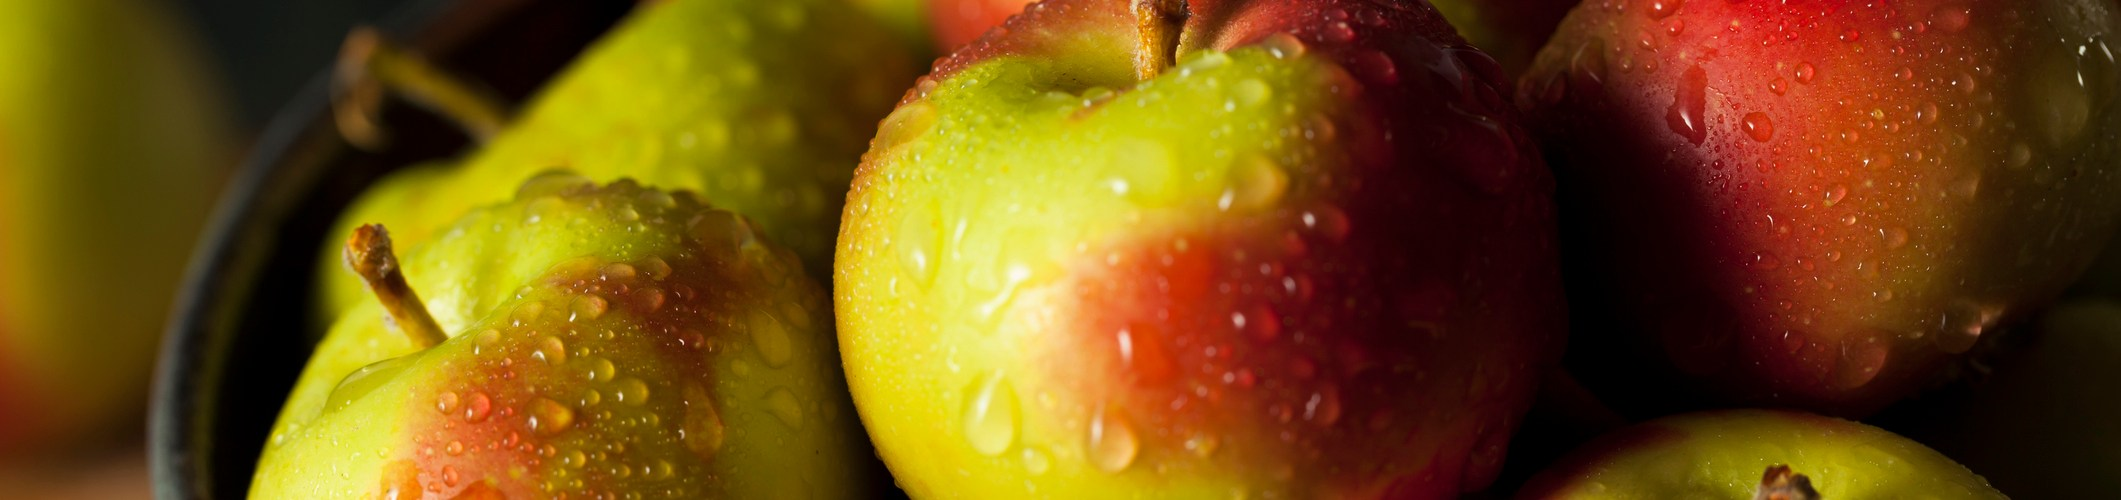 Raw Organic Lady Apples